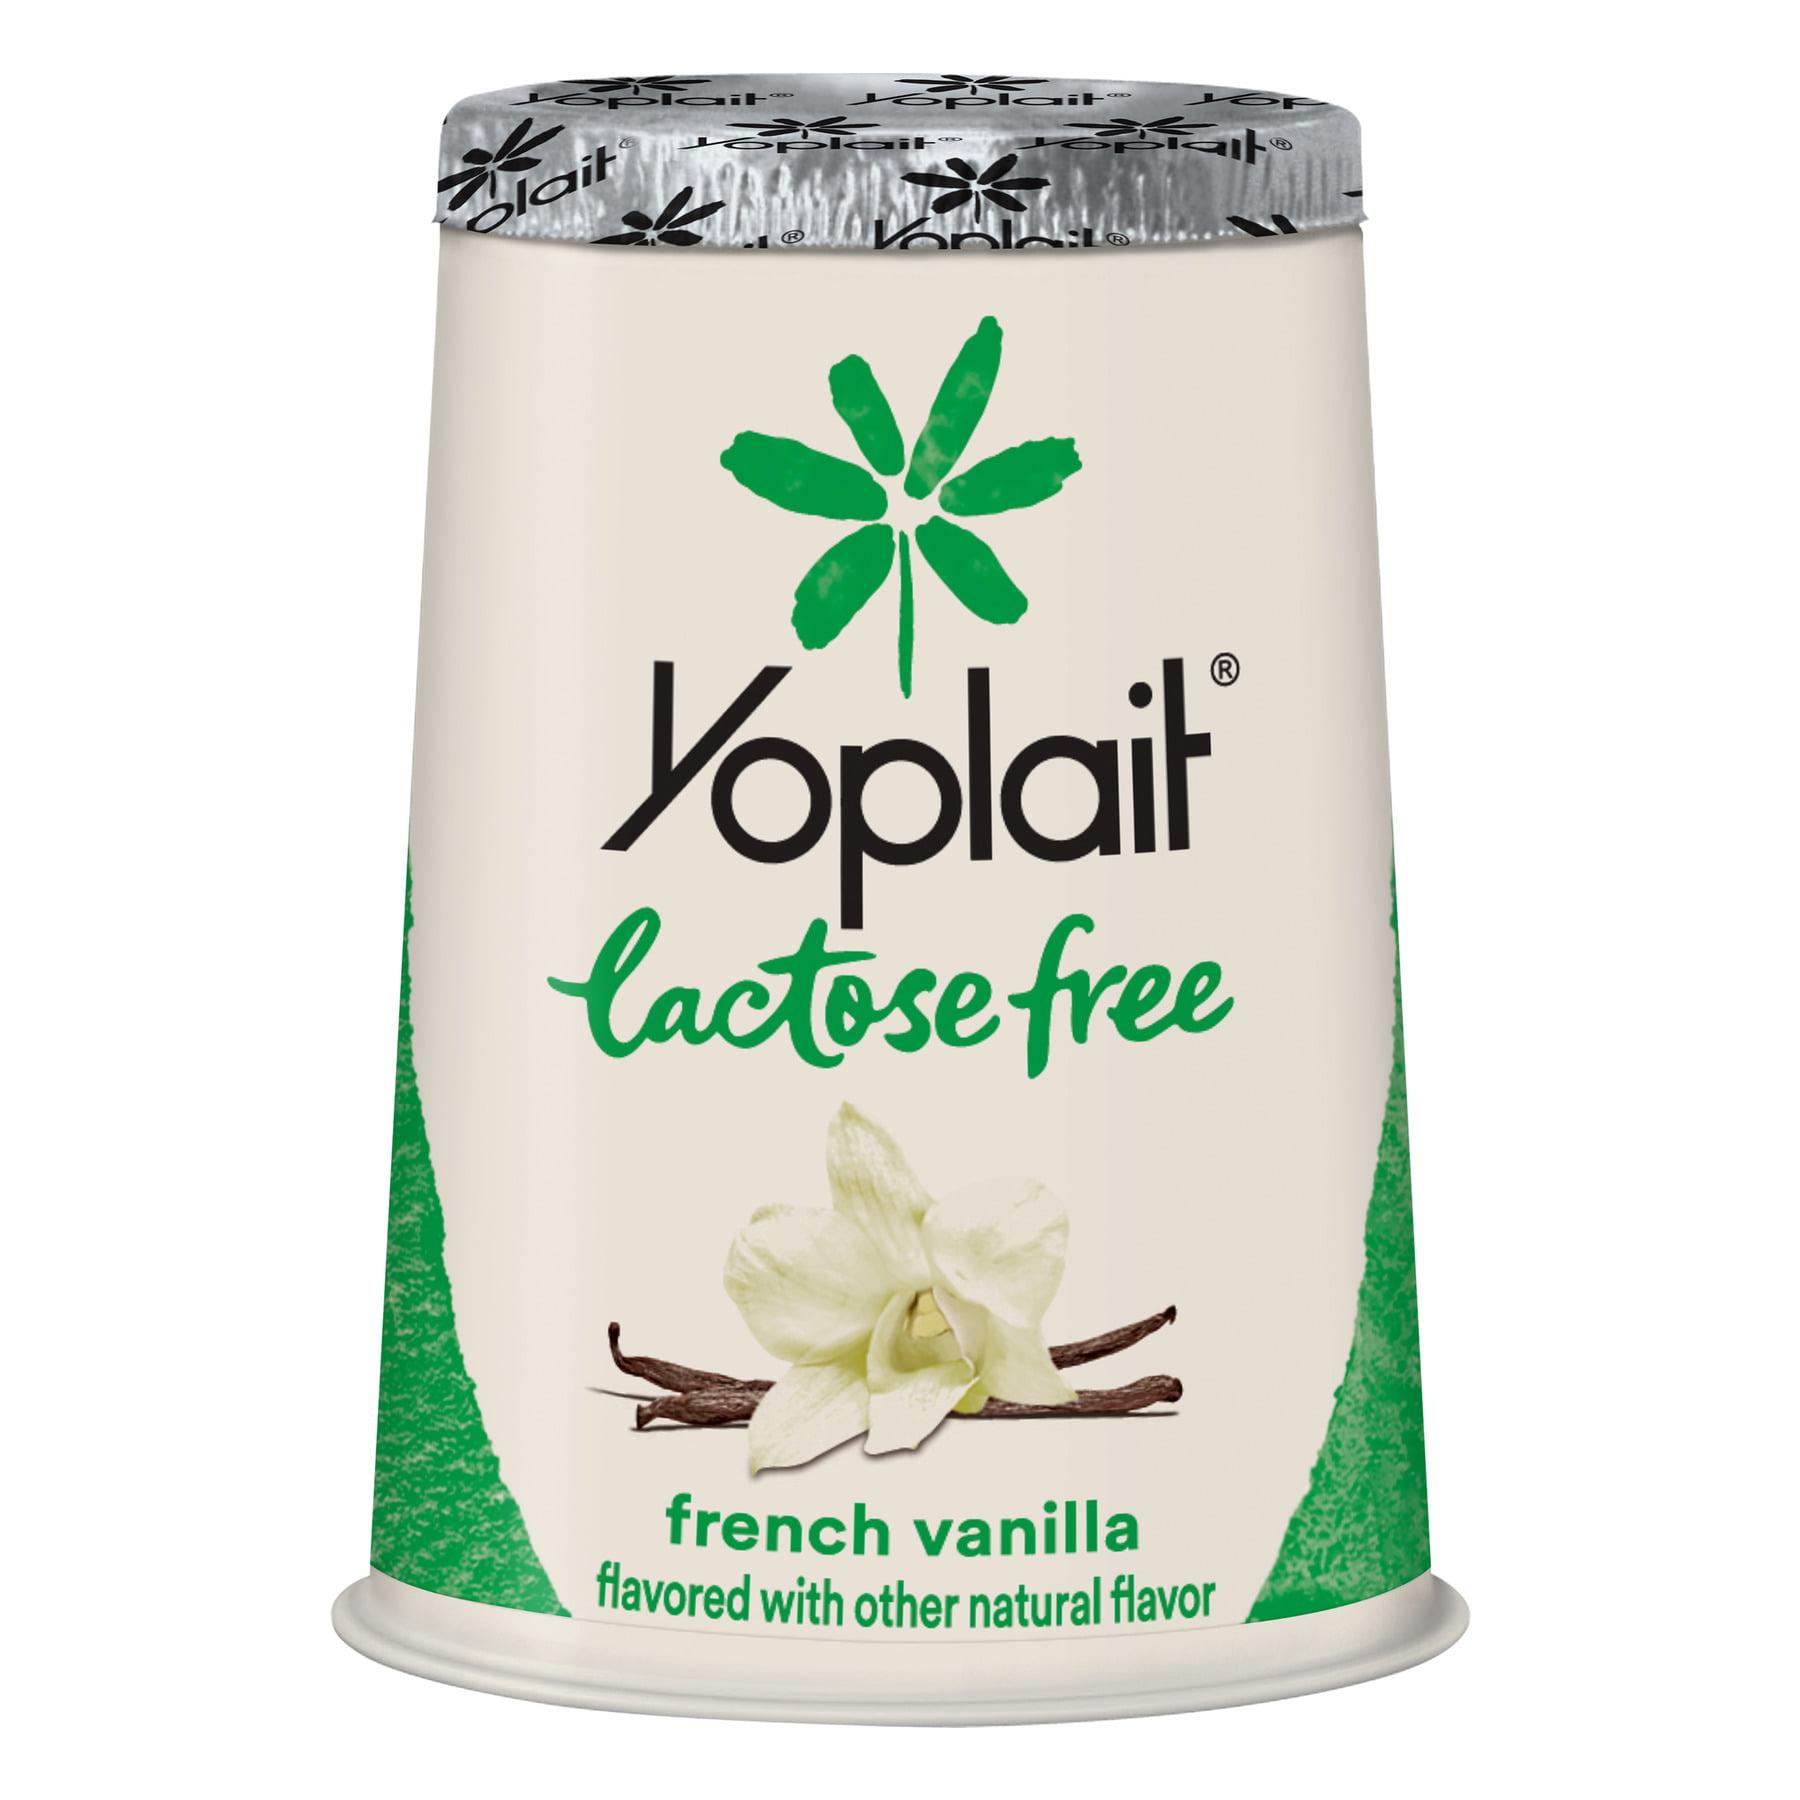 Yoplait Lactose Free Yogurt French Vanilla, 6 oz Cup